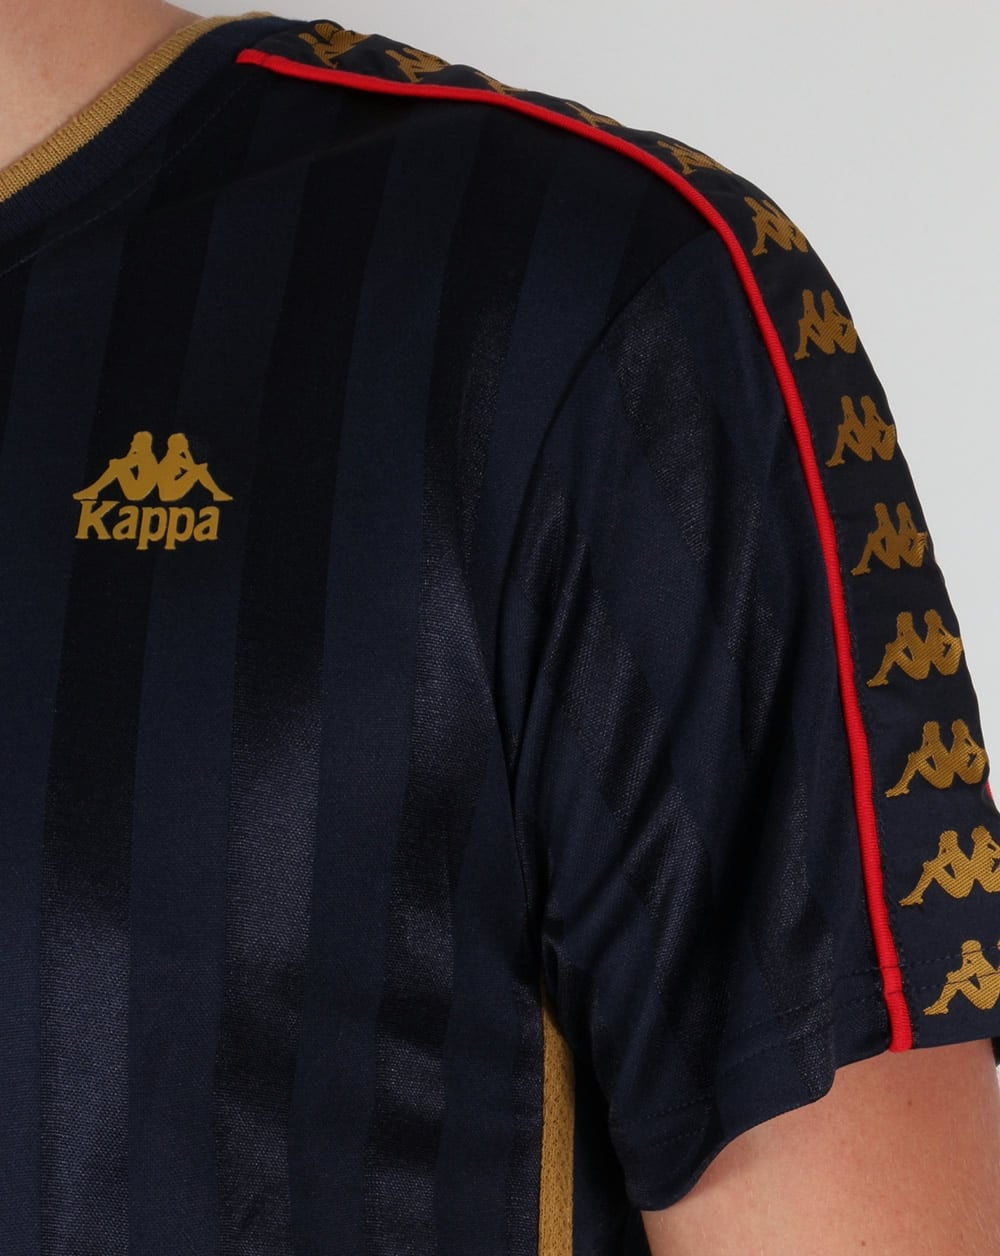 Robe Di Kappa Ewood T-shirt Navy,football,tee,mens